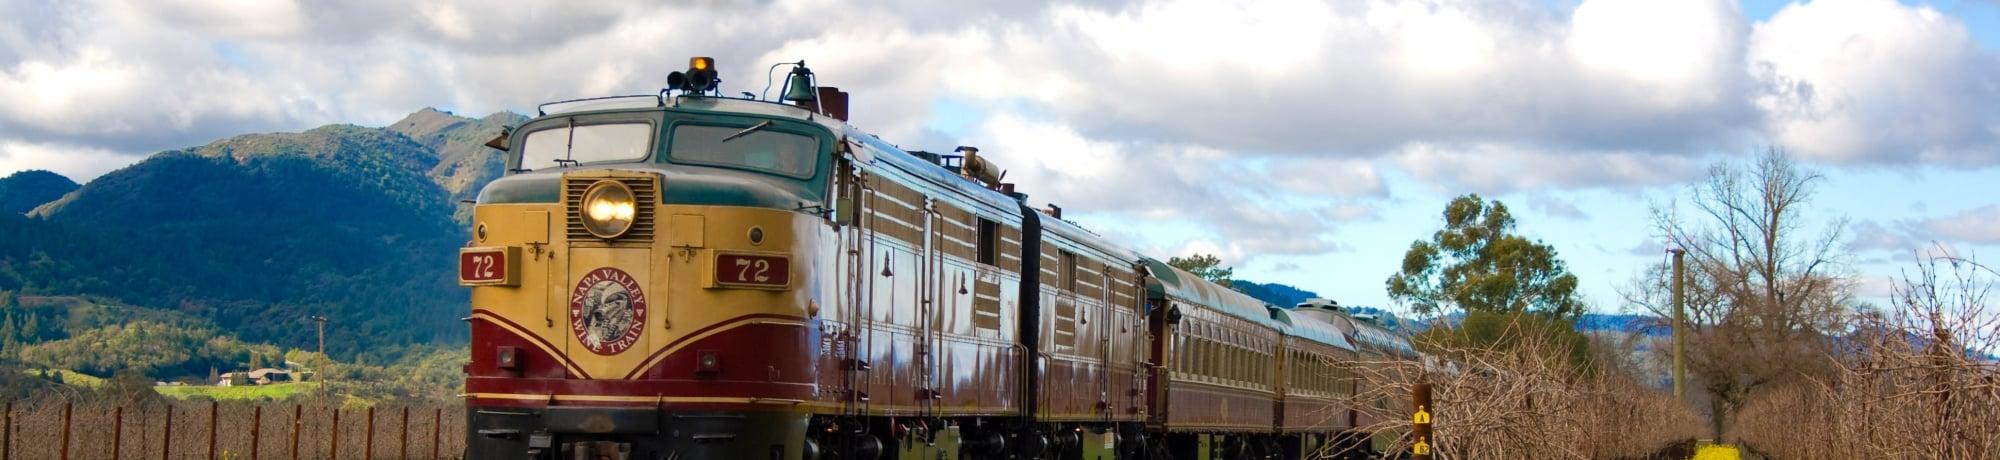 The Napa Valley Wine Train runs alongside a California vineyard.